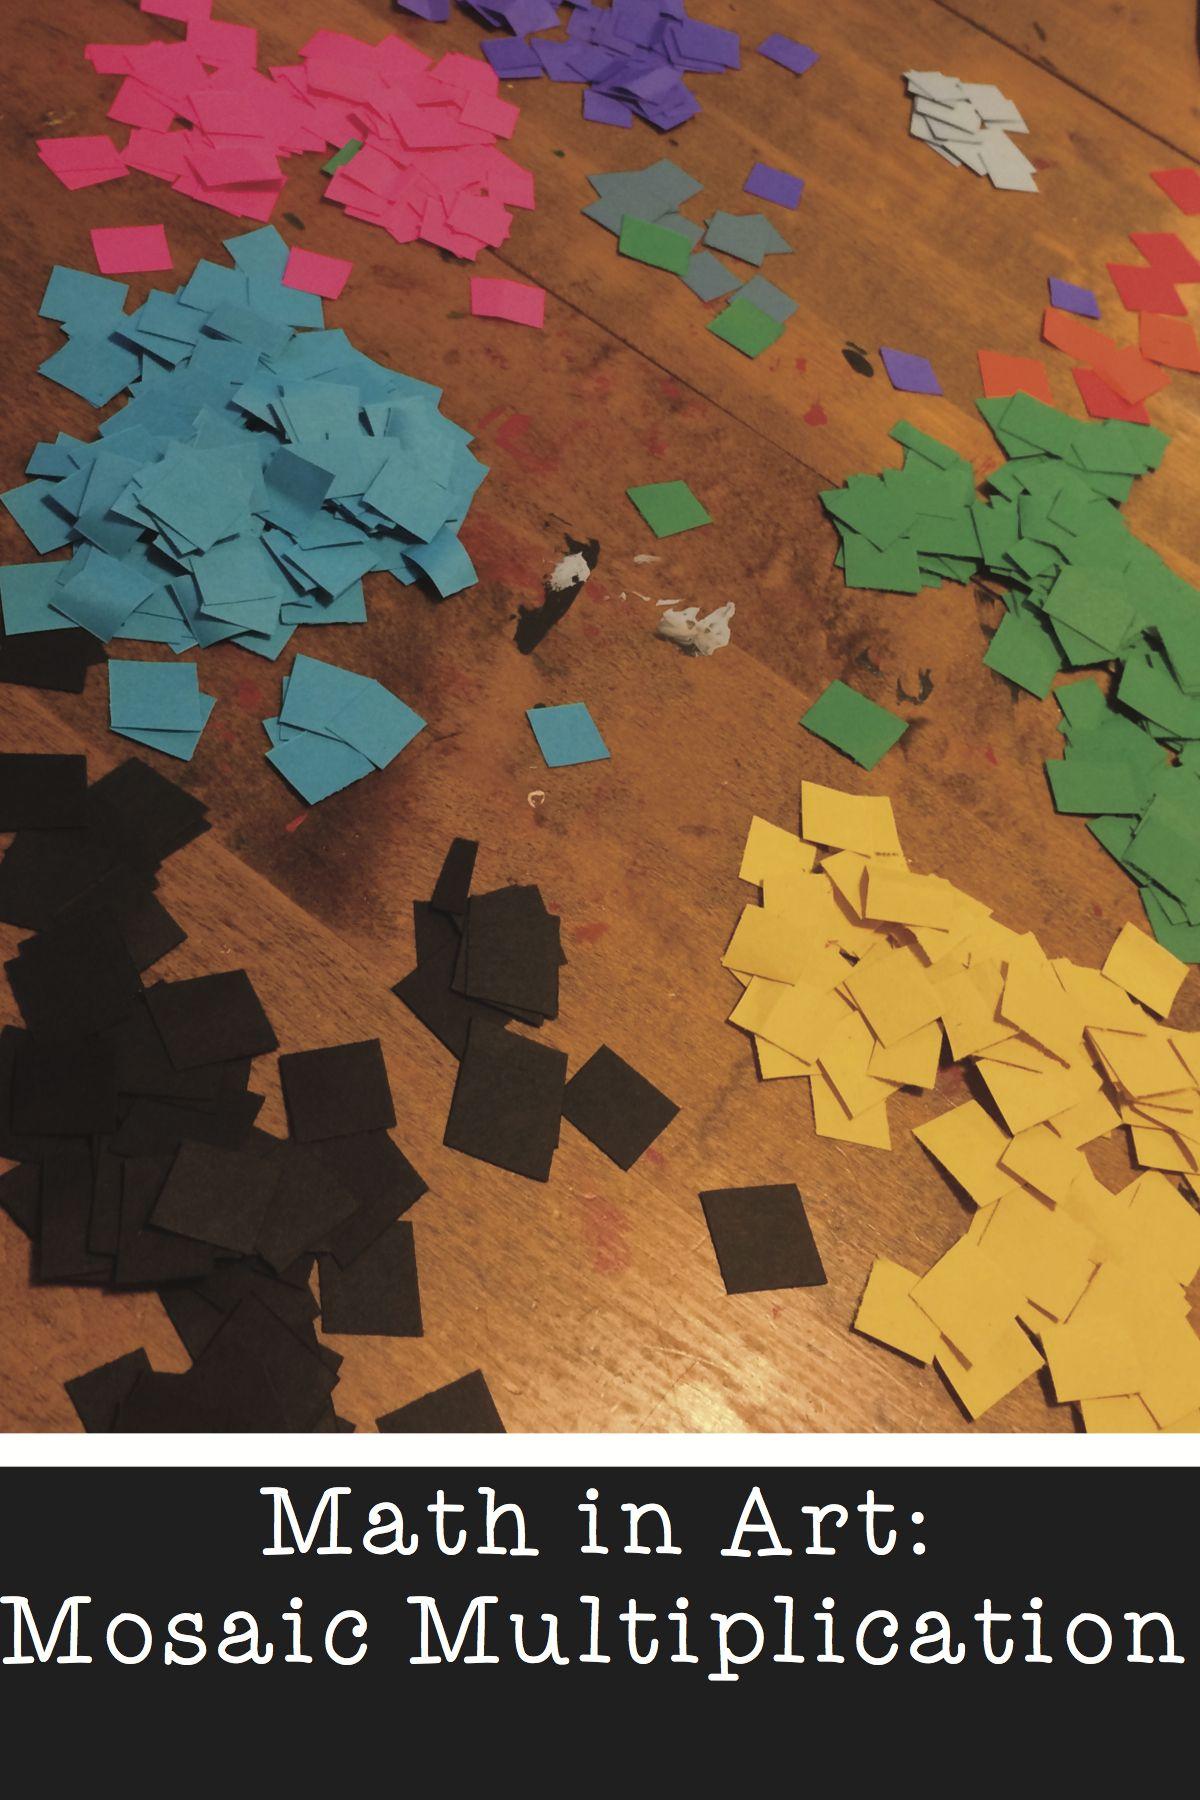 Math In Art Multiplication Mosaic Blog Article